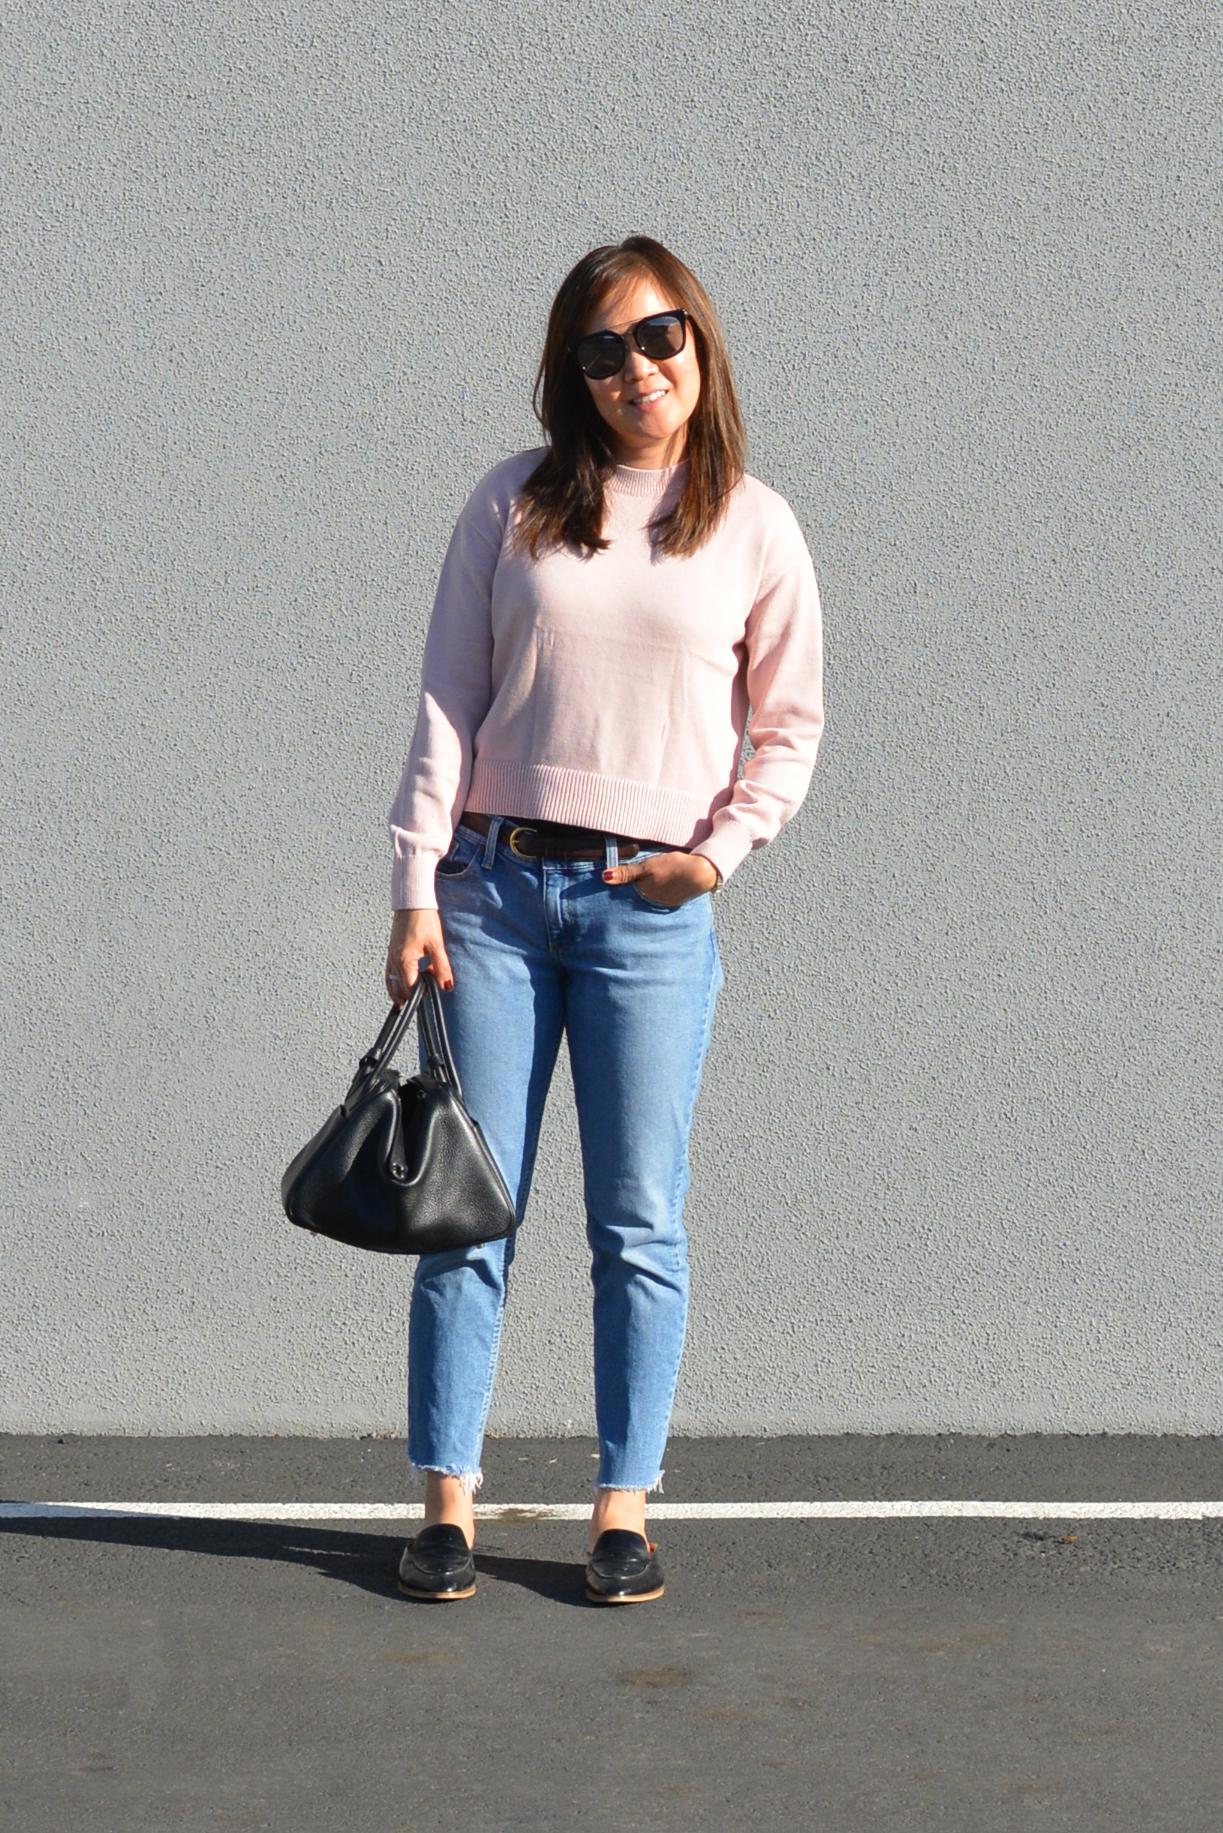 Mott & Bow Jeans, part of the best list